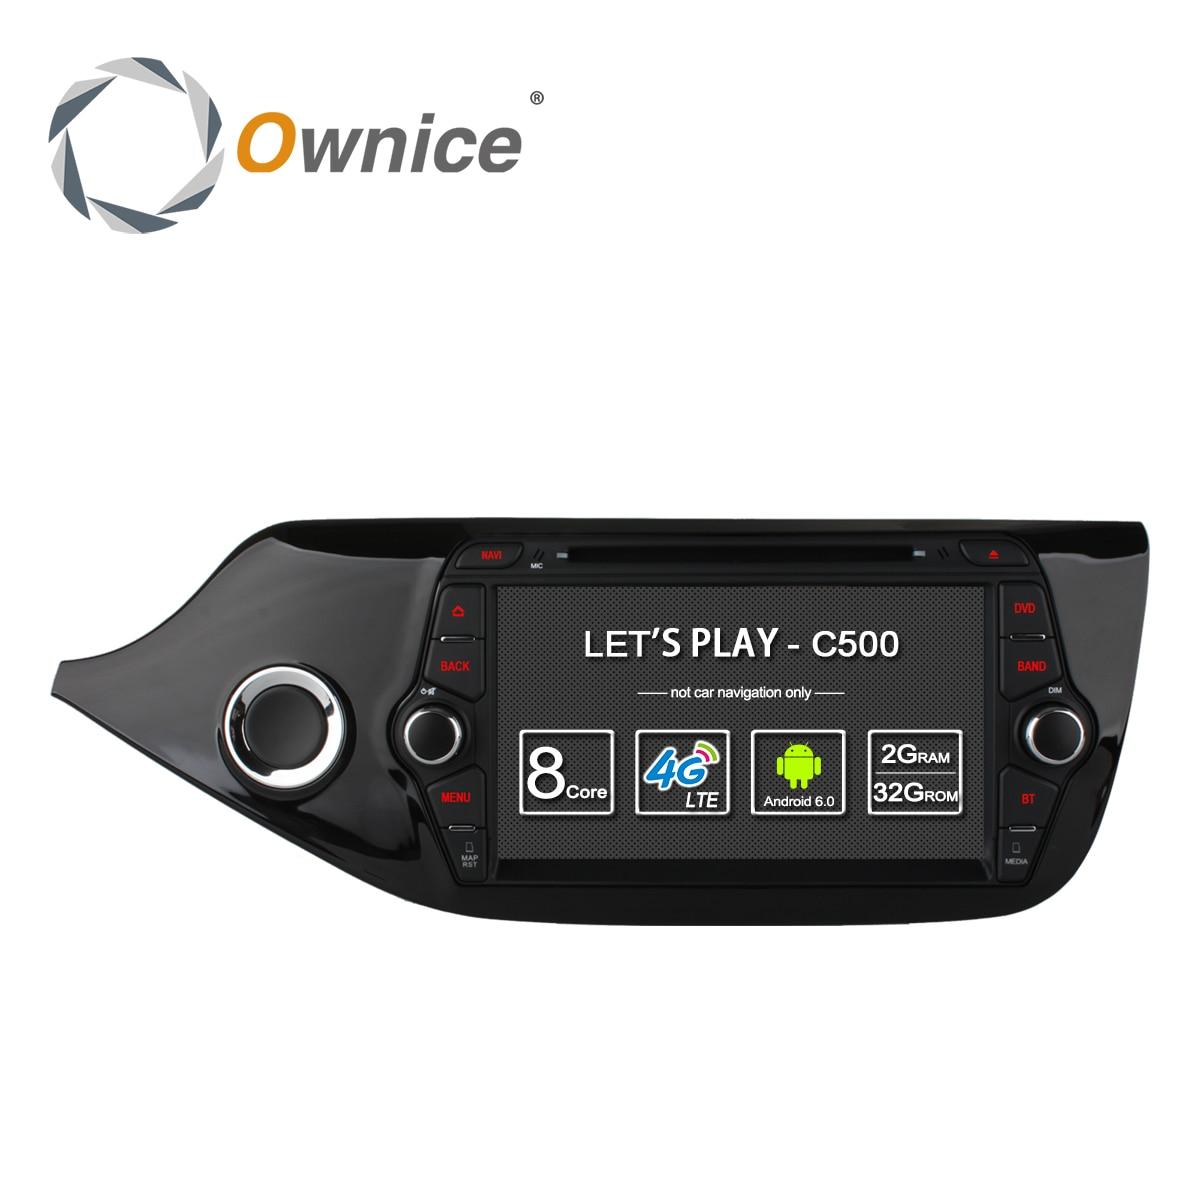 Ownice C500 8 4g SIM LTE Octa Núcleo Android 6.0 Para Kia CEED 2013-2015 Car DVD Player GPS Navi BT Rádio WIFI 4g 2 gb RAM 32g ROM